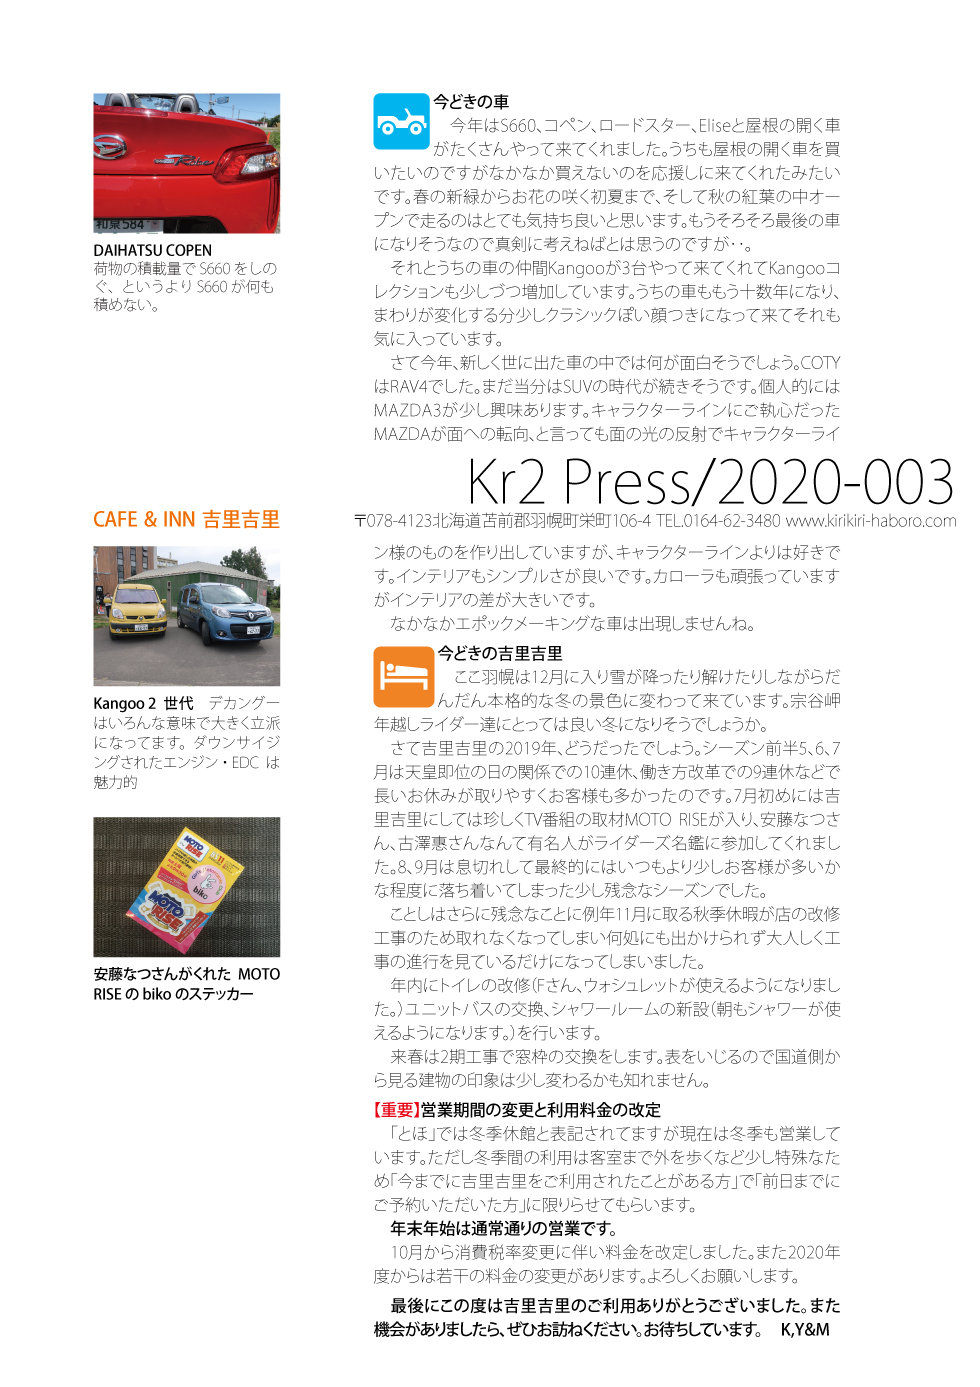 2020Kr2Press03.jpg